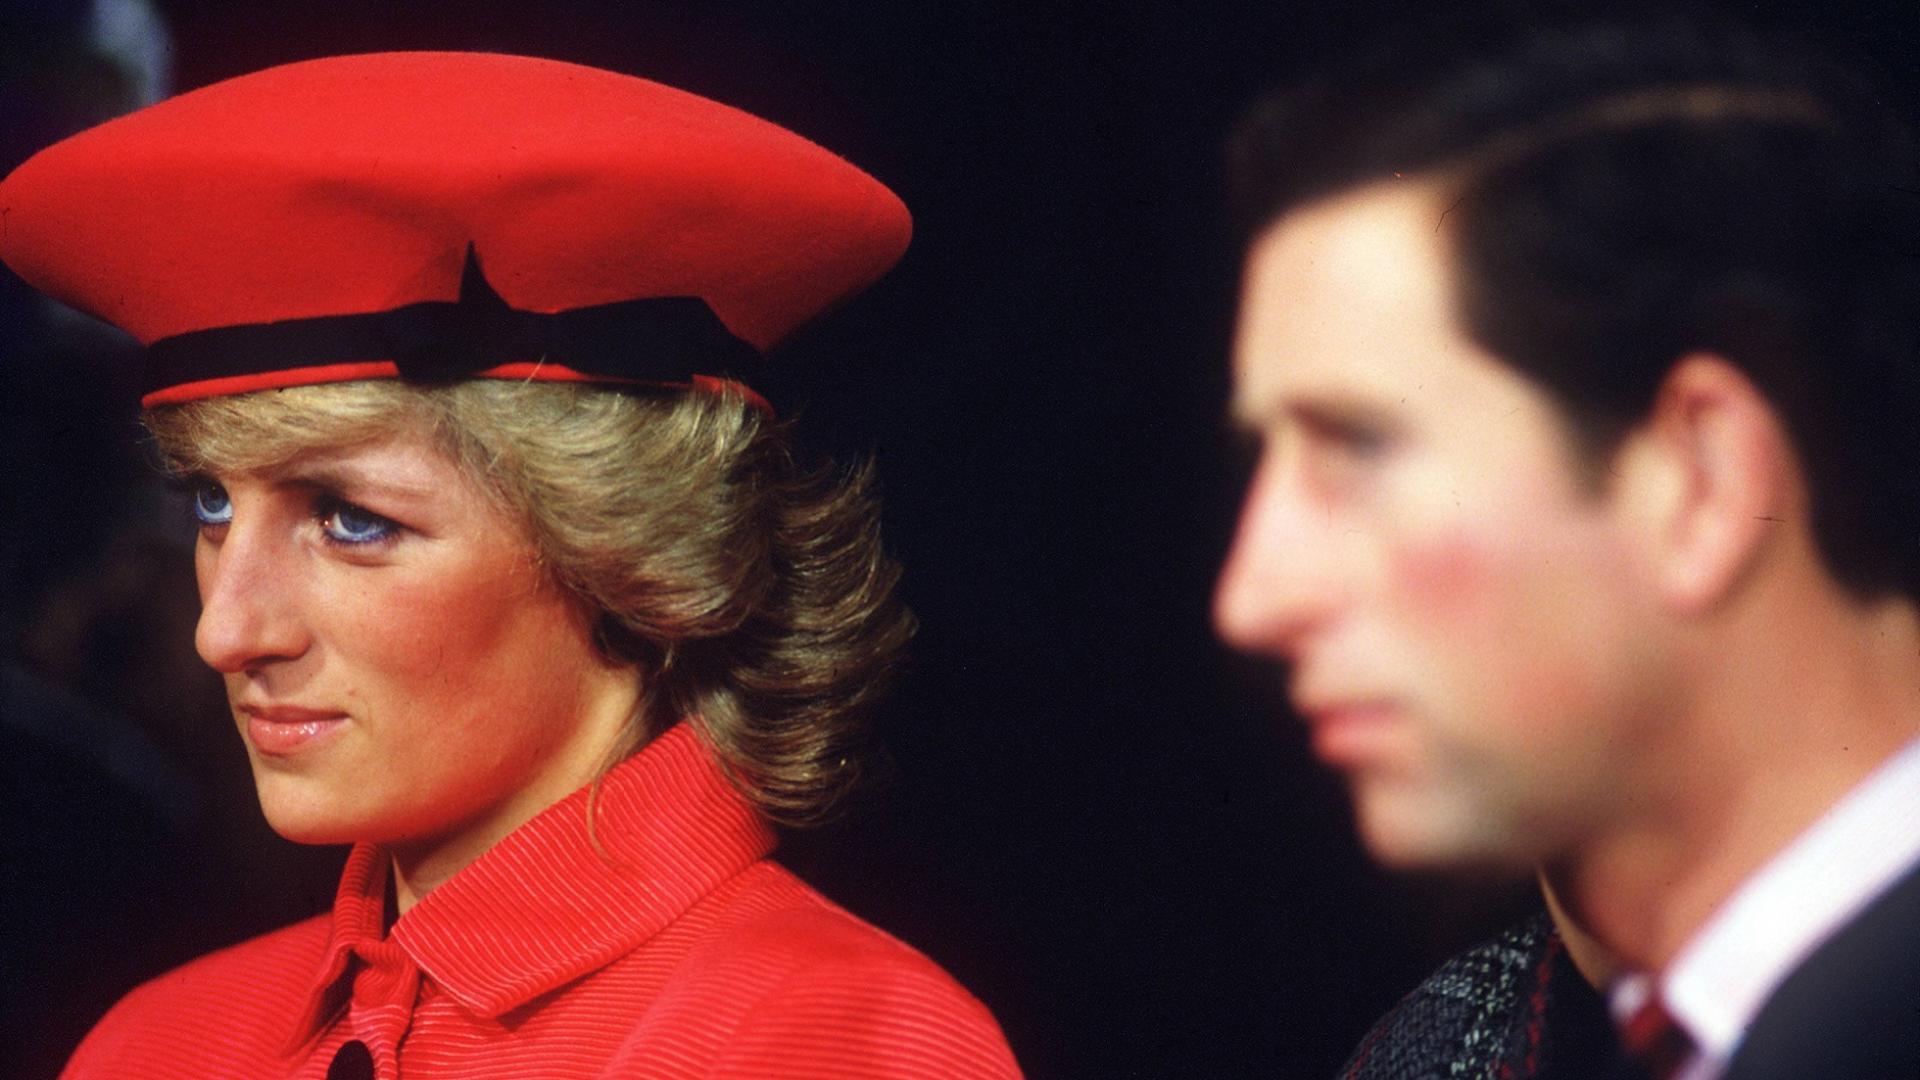 Lady Diana mit roter Mütze und rotem Mantel neben Prinz Charles